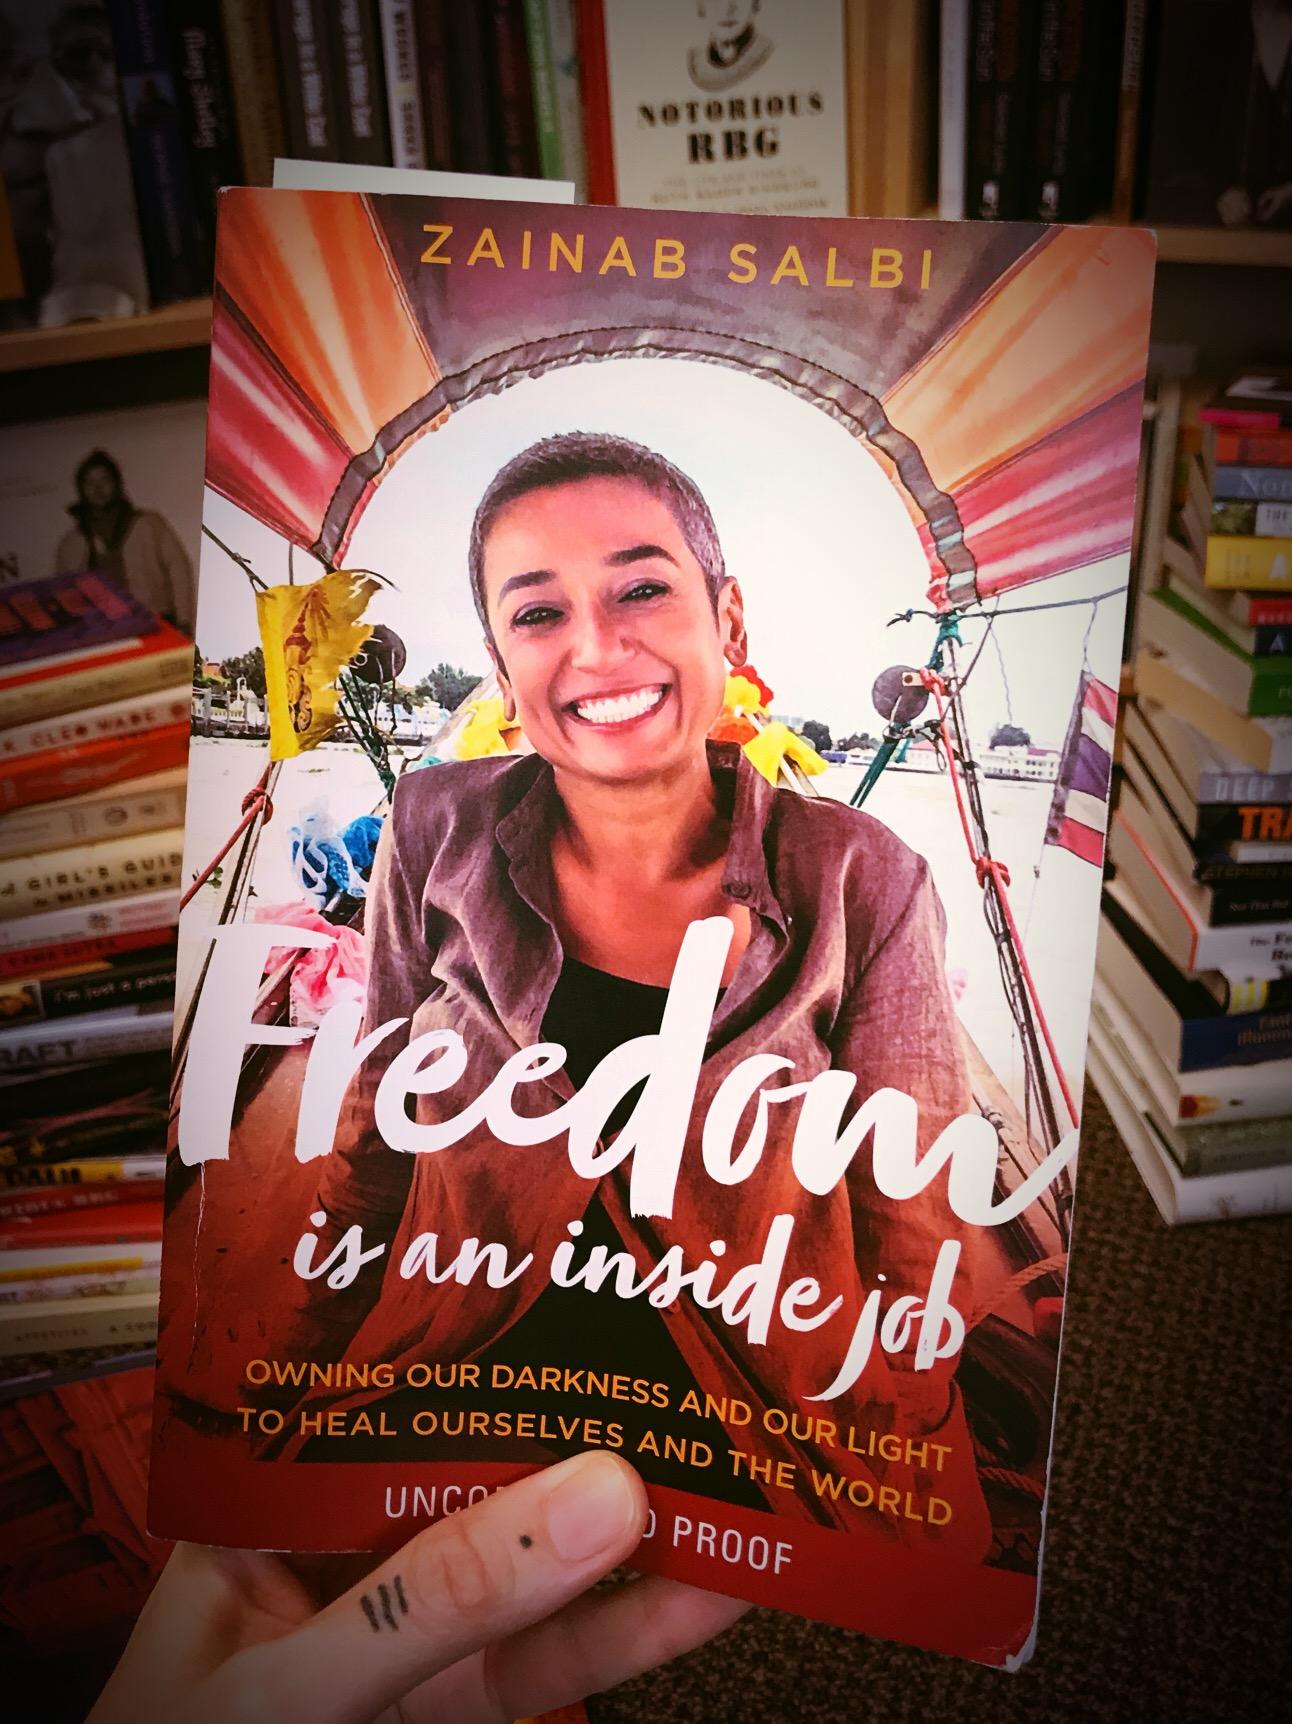 Freedom is an inside job by Zainab Salbi